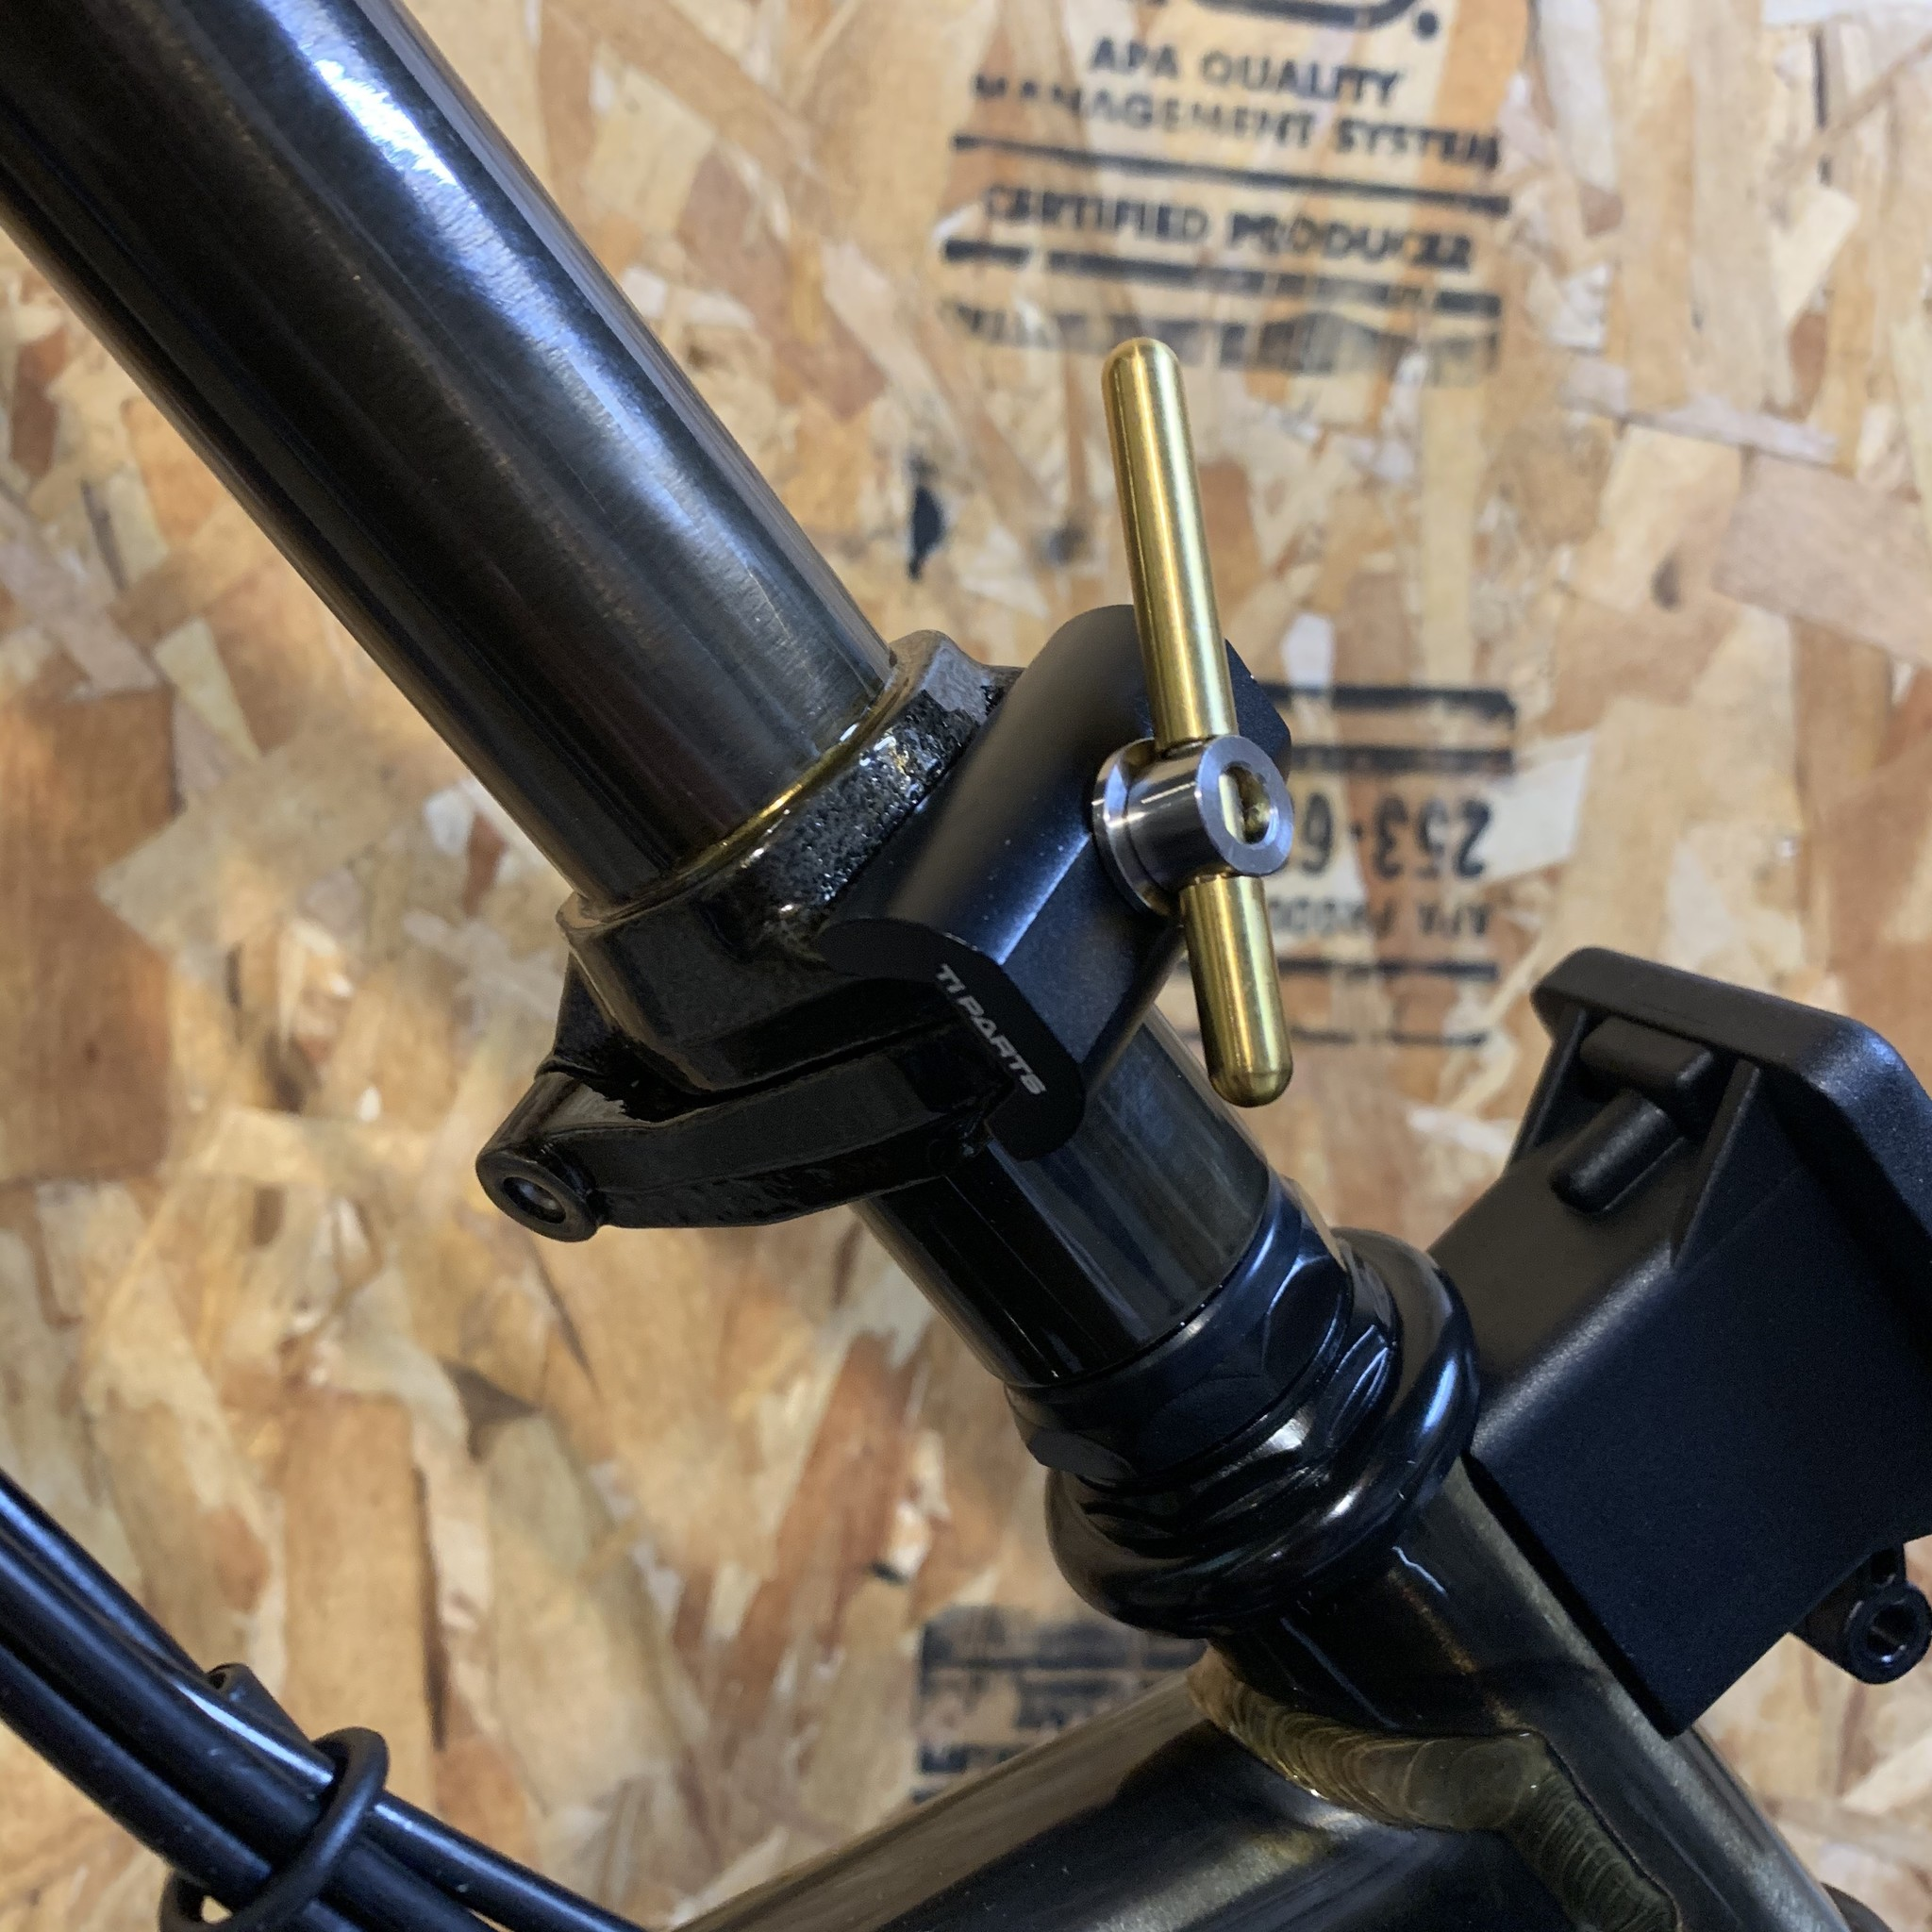 Ti Parts Workshop Carbon//Titanium Hinge Clamp Levers Black for Brompton Bicycle